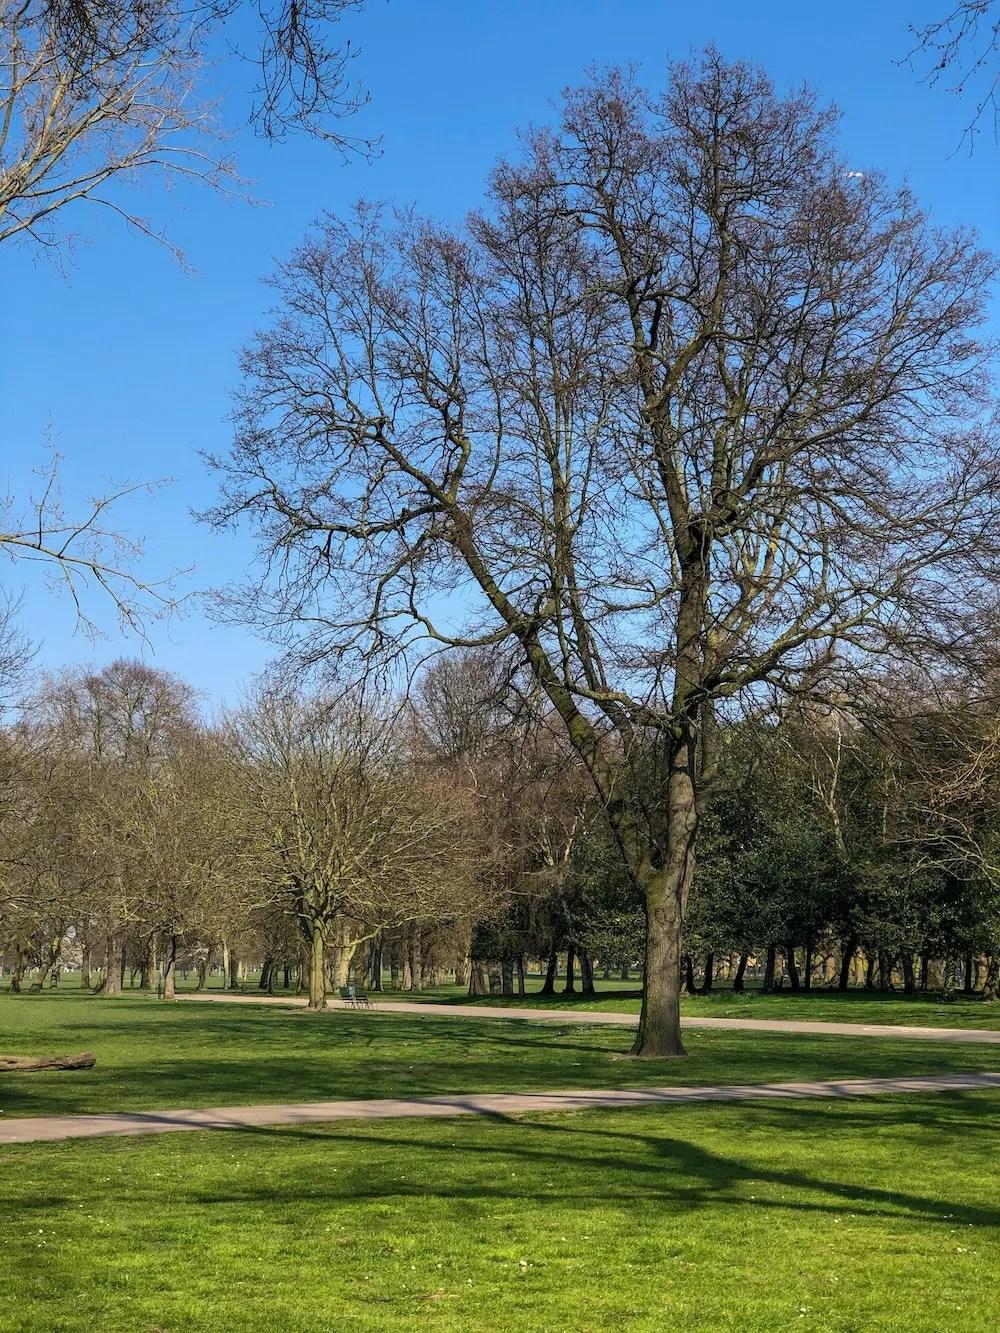 Best Parks in London - Victoria Park